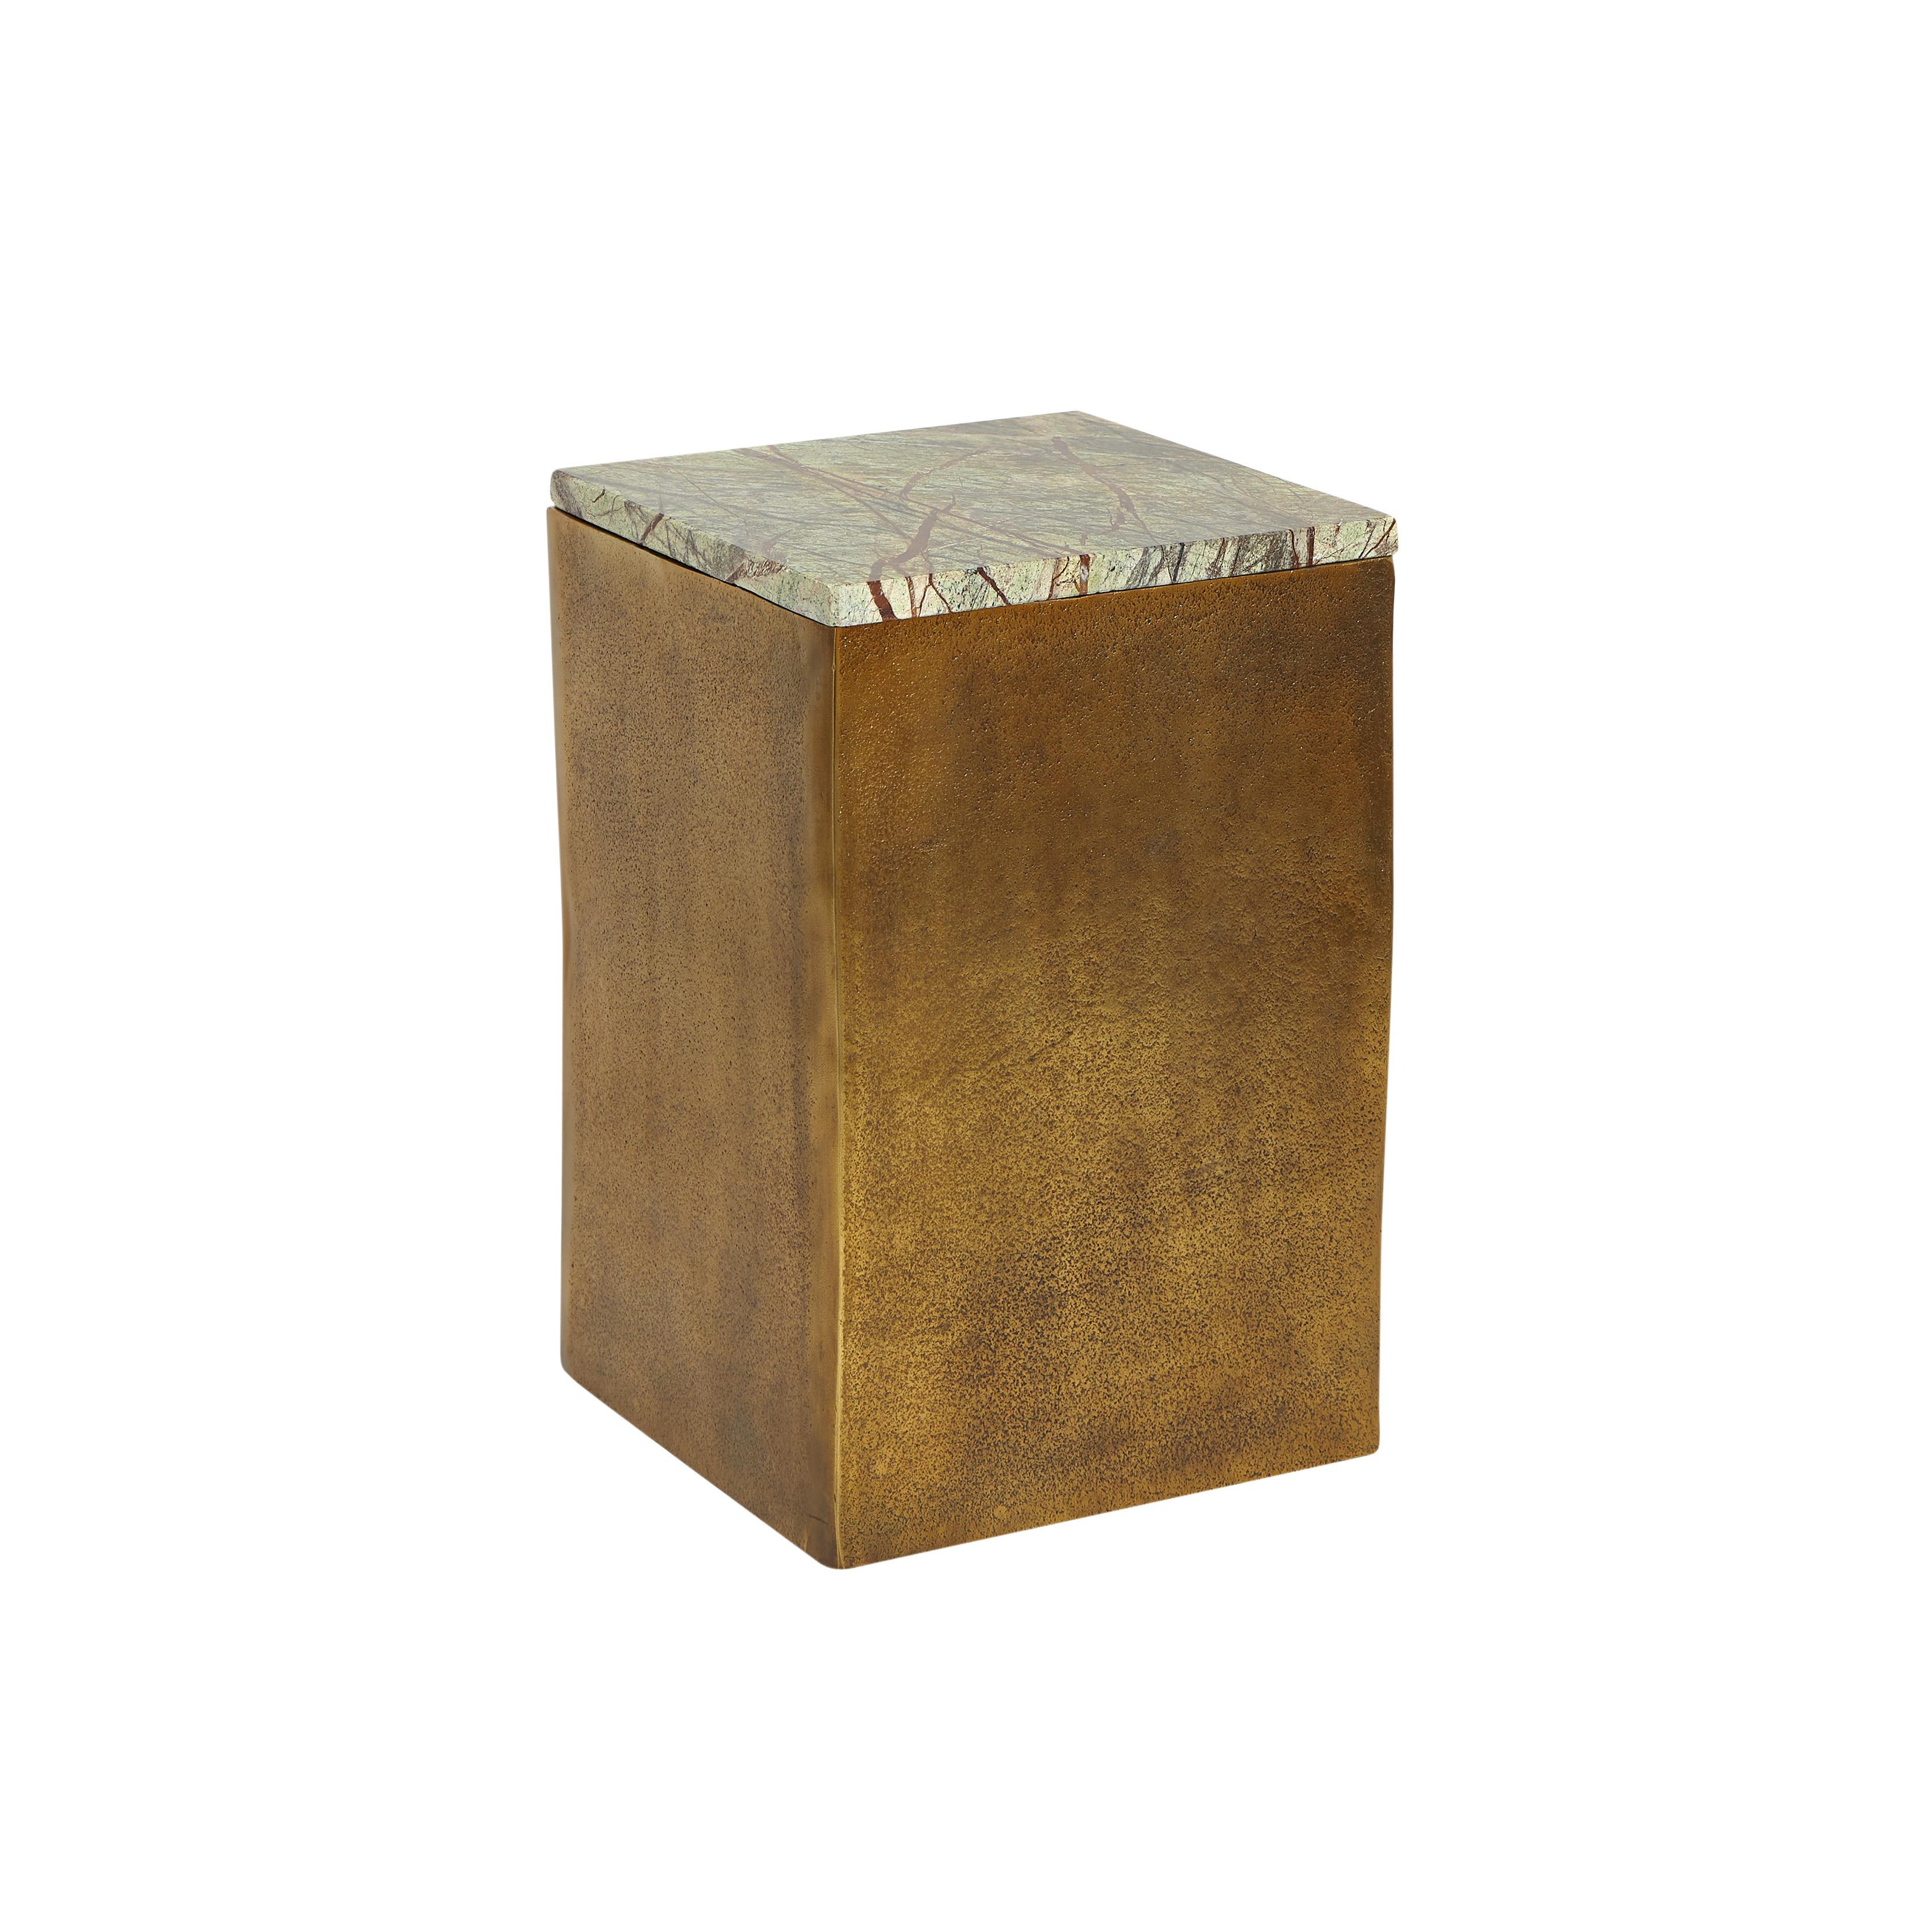 Tavolino alluminio e marmo Drum, Marrone bronzo, large image number 0